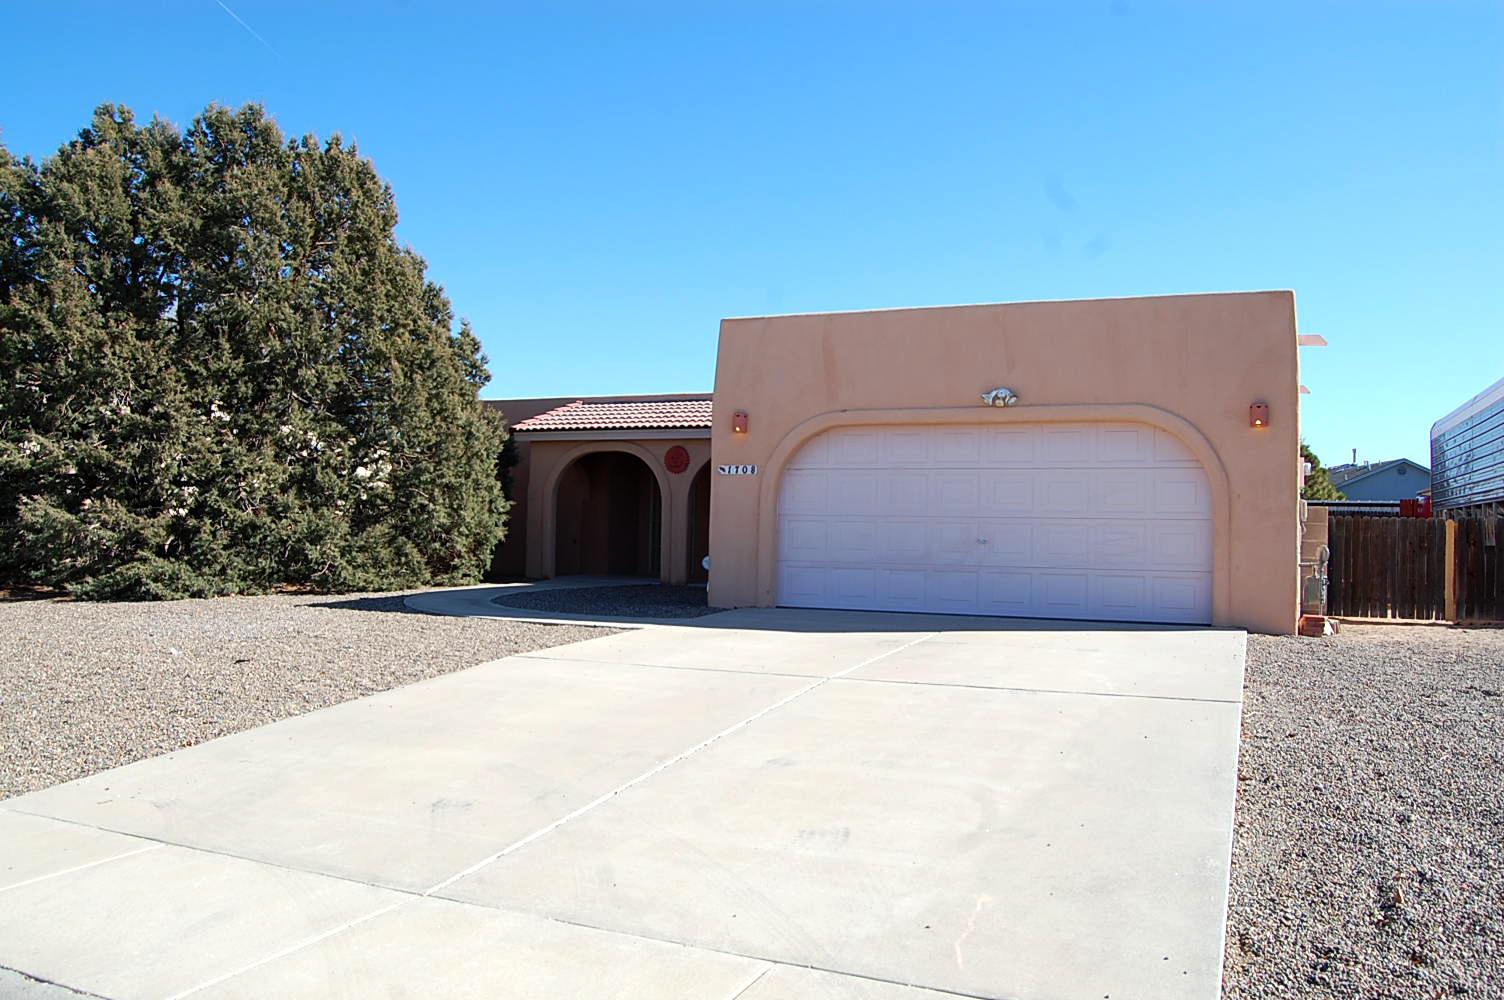 1708 JACK NICKLAUS Drive, Rio Communities, NM 87002 - Rio Communities, NM real estate listing